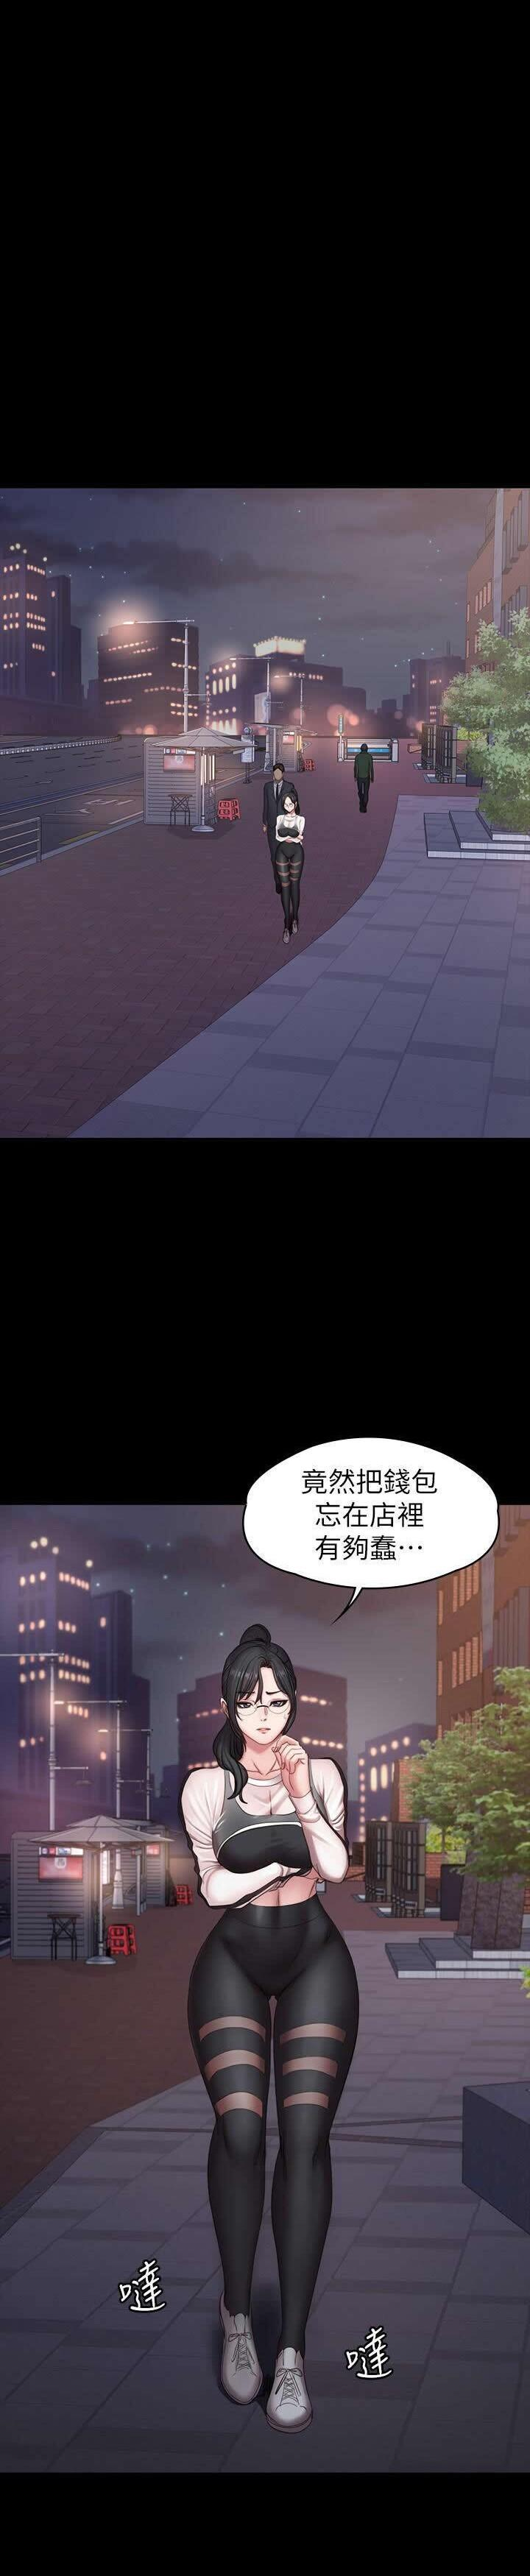 FITNESS 61-88 CHI 306